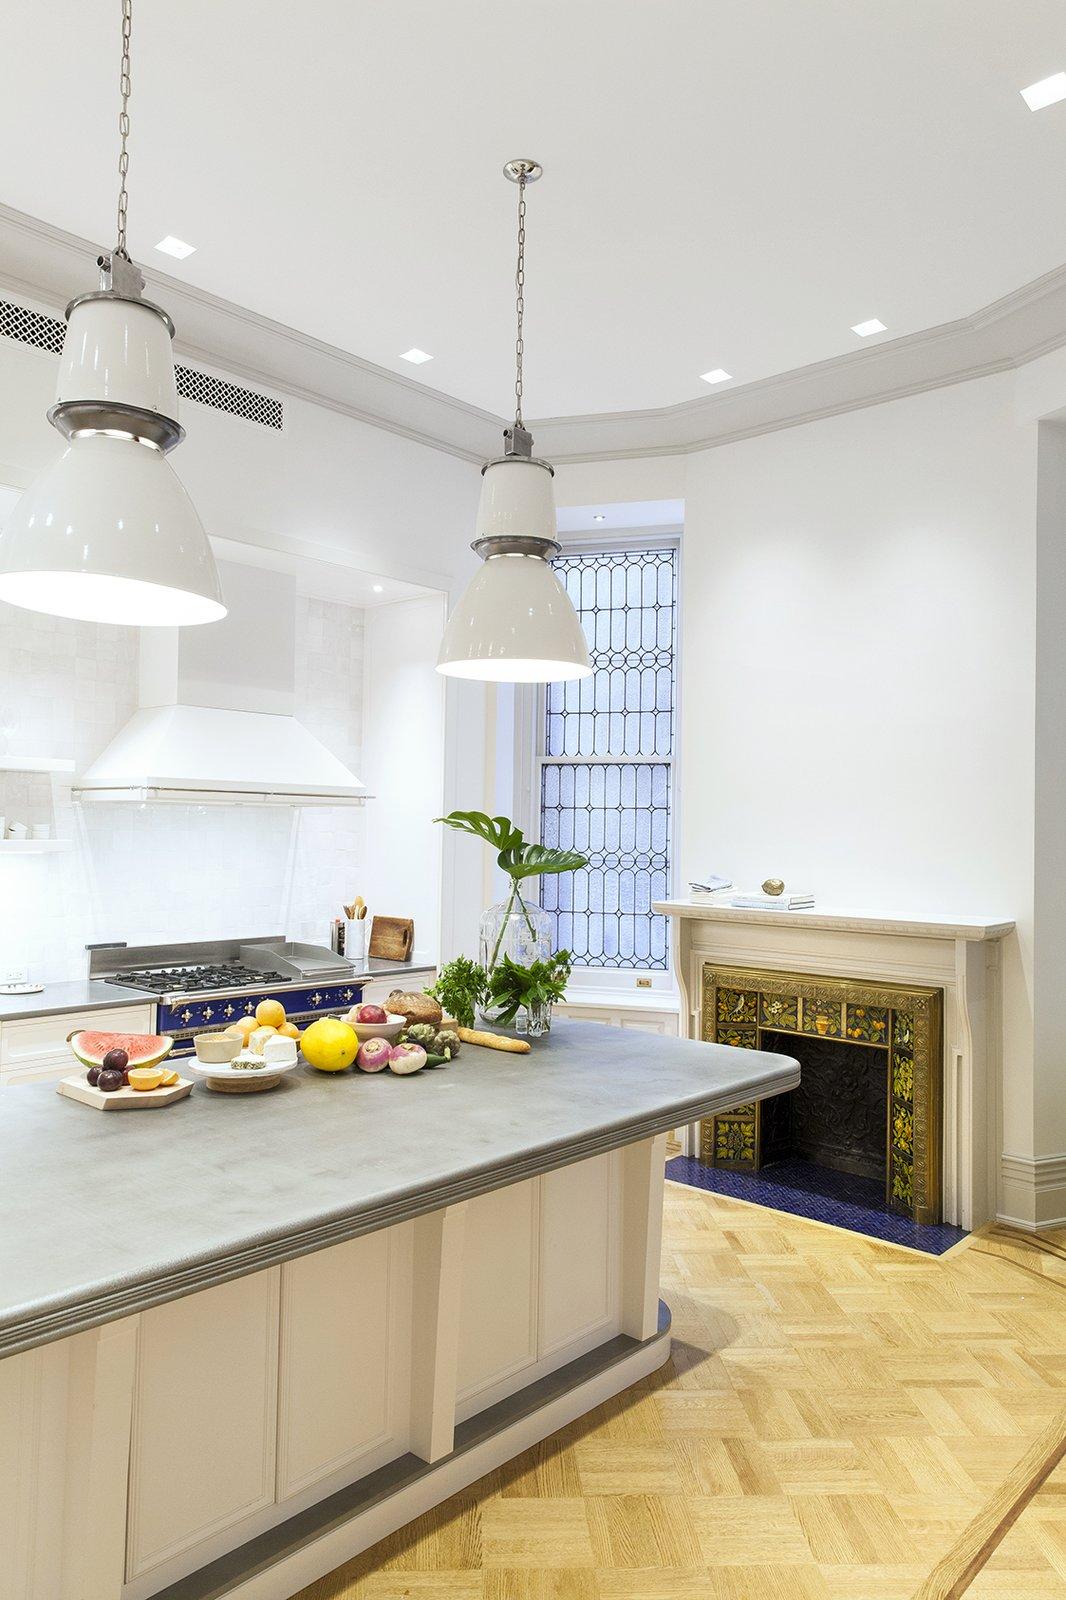 Osborne Residence by Fogarty Finger Architects kitchen